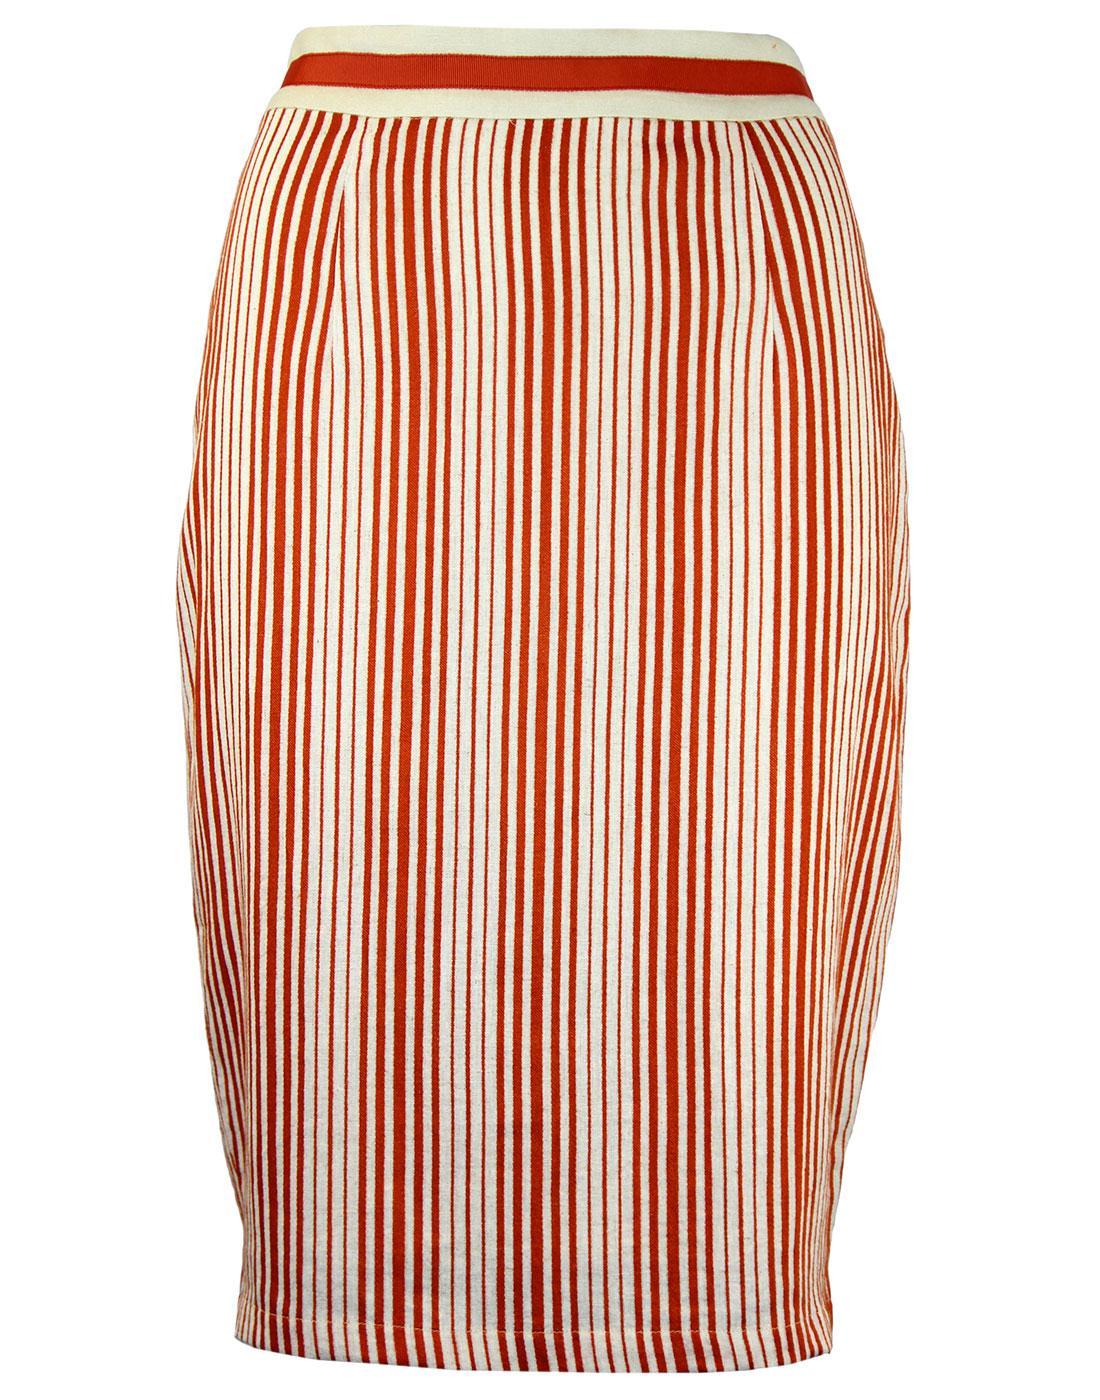 Barbican FEVER Retro 50s Linen Stripe Pencil Skirt